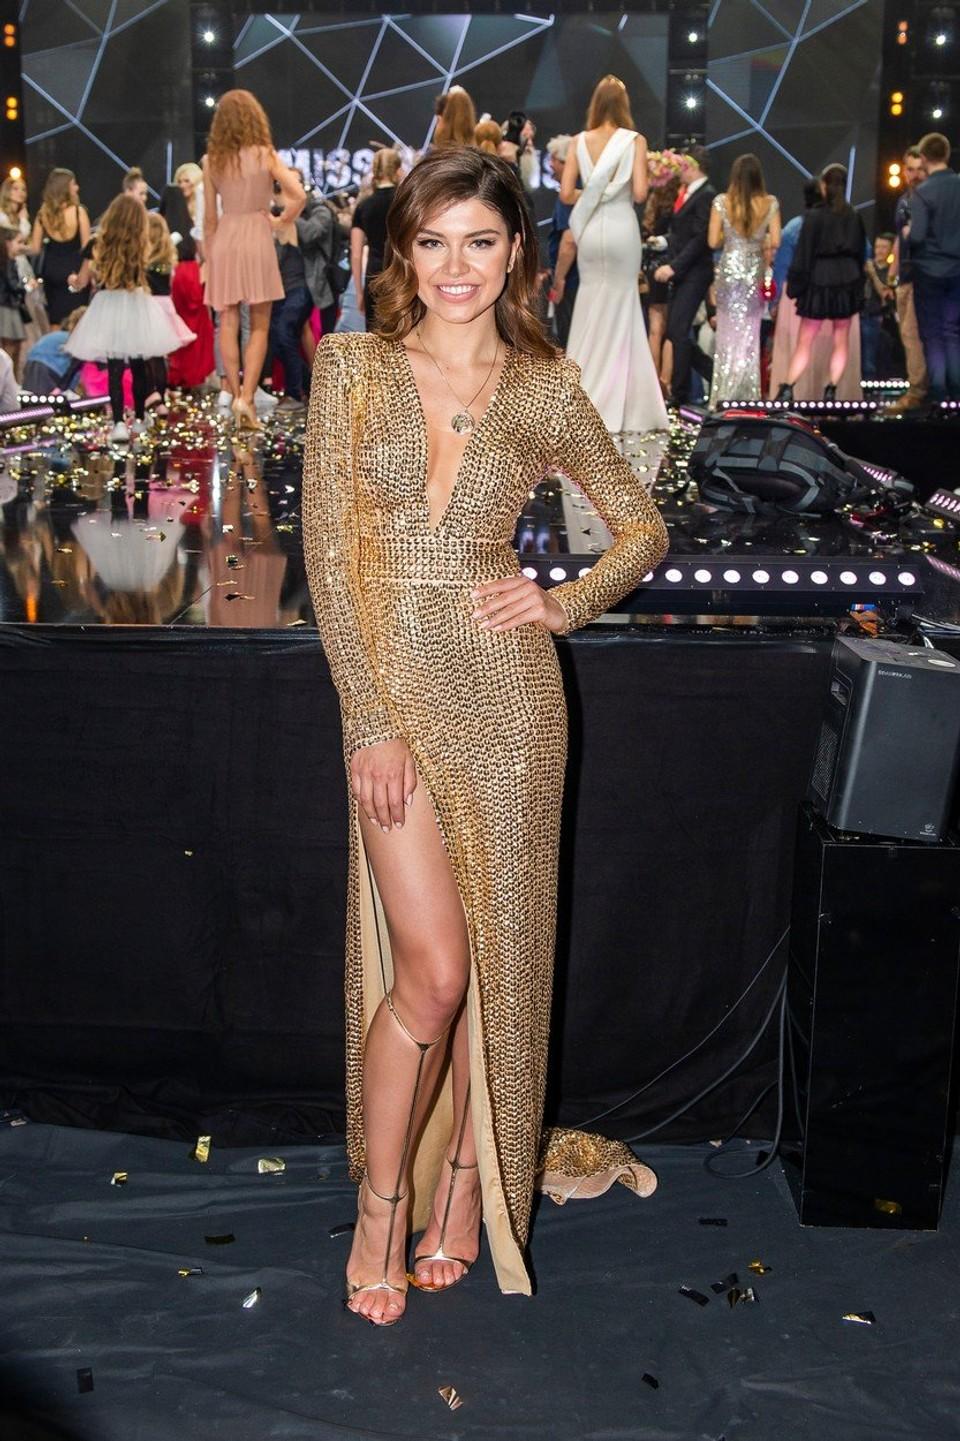 Karolína Chomisteková – Miss Slovensko 2013